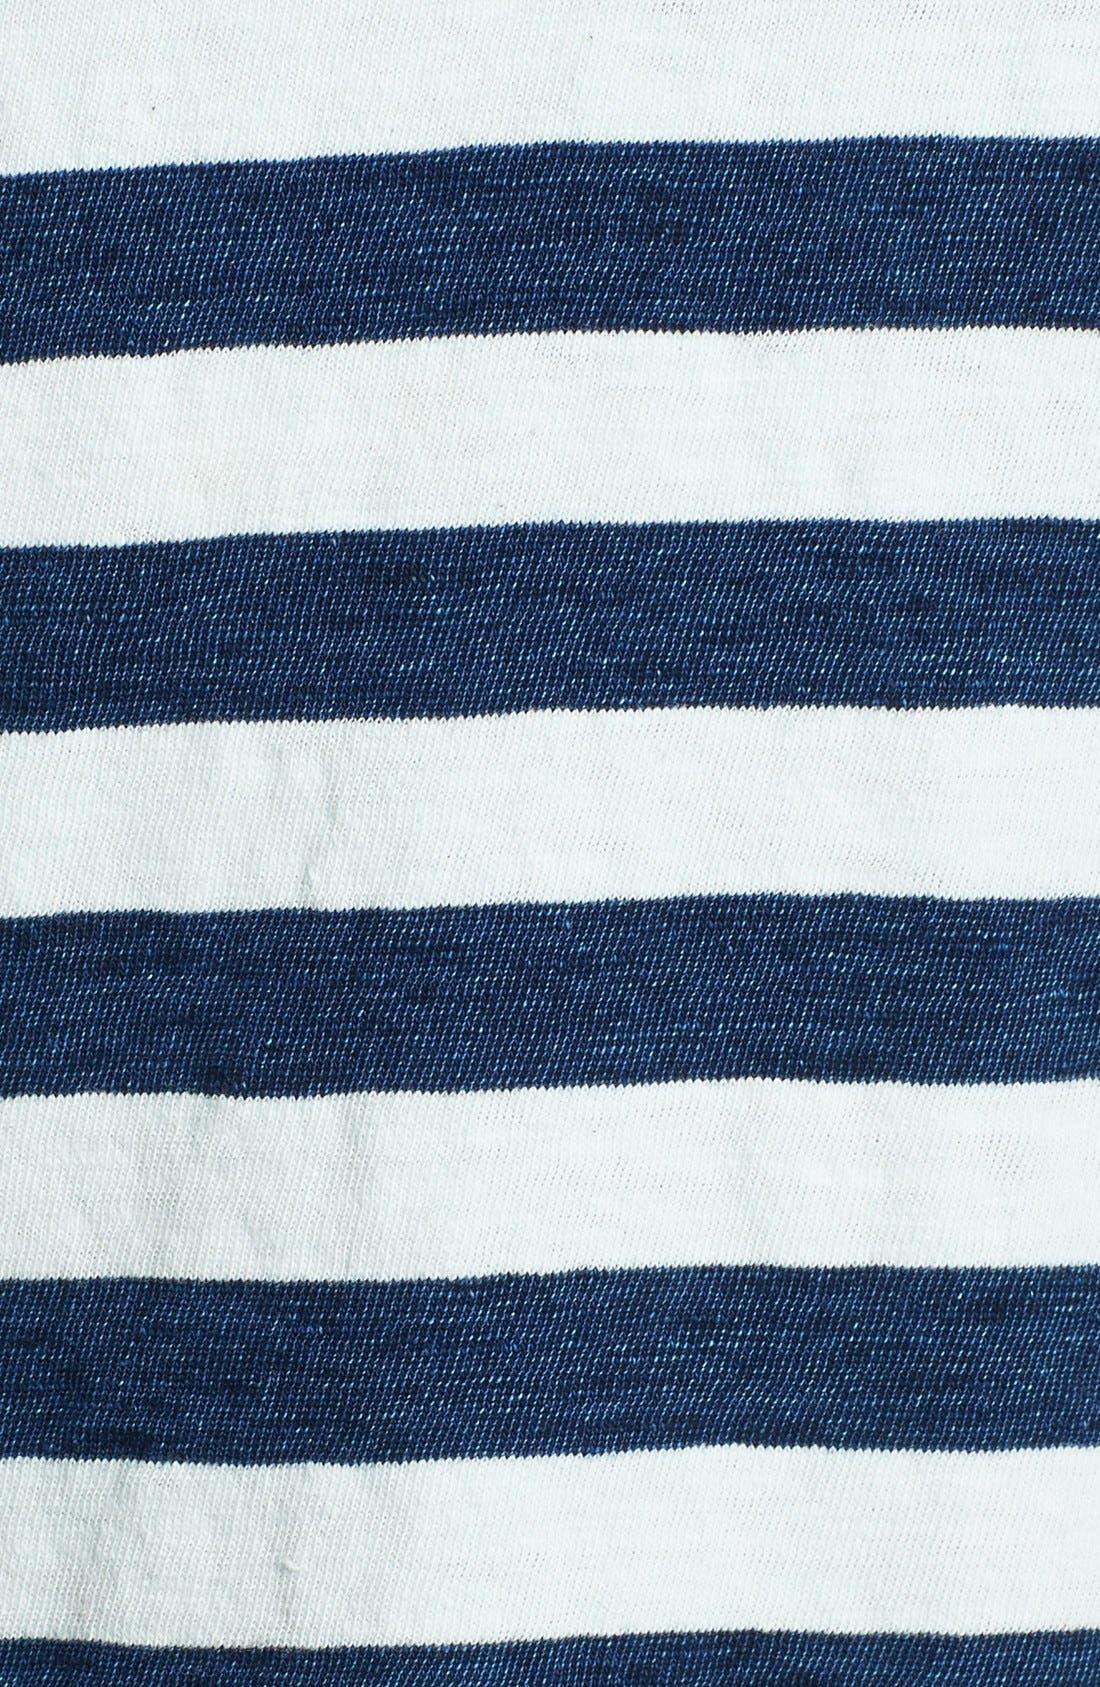 Alternate Image 3  - Splendid Stripe Scoop Neck Cotton Tee